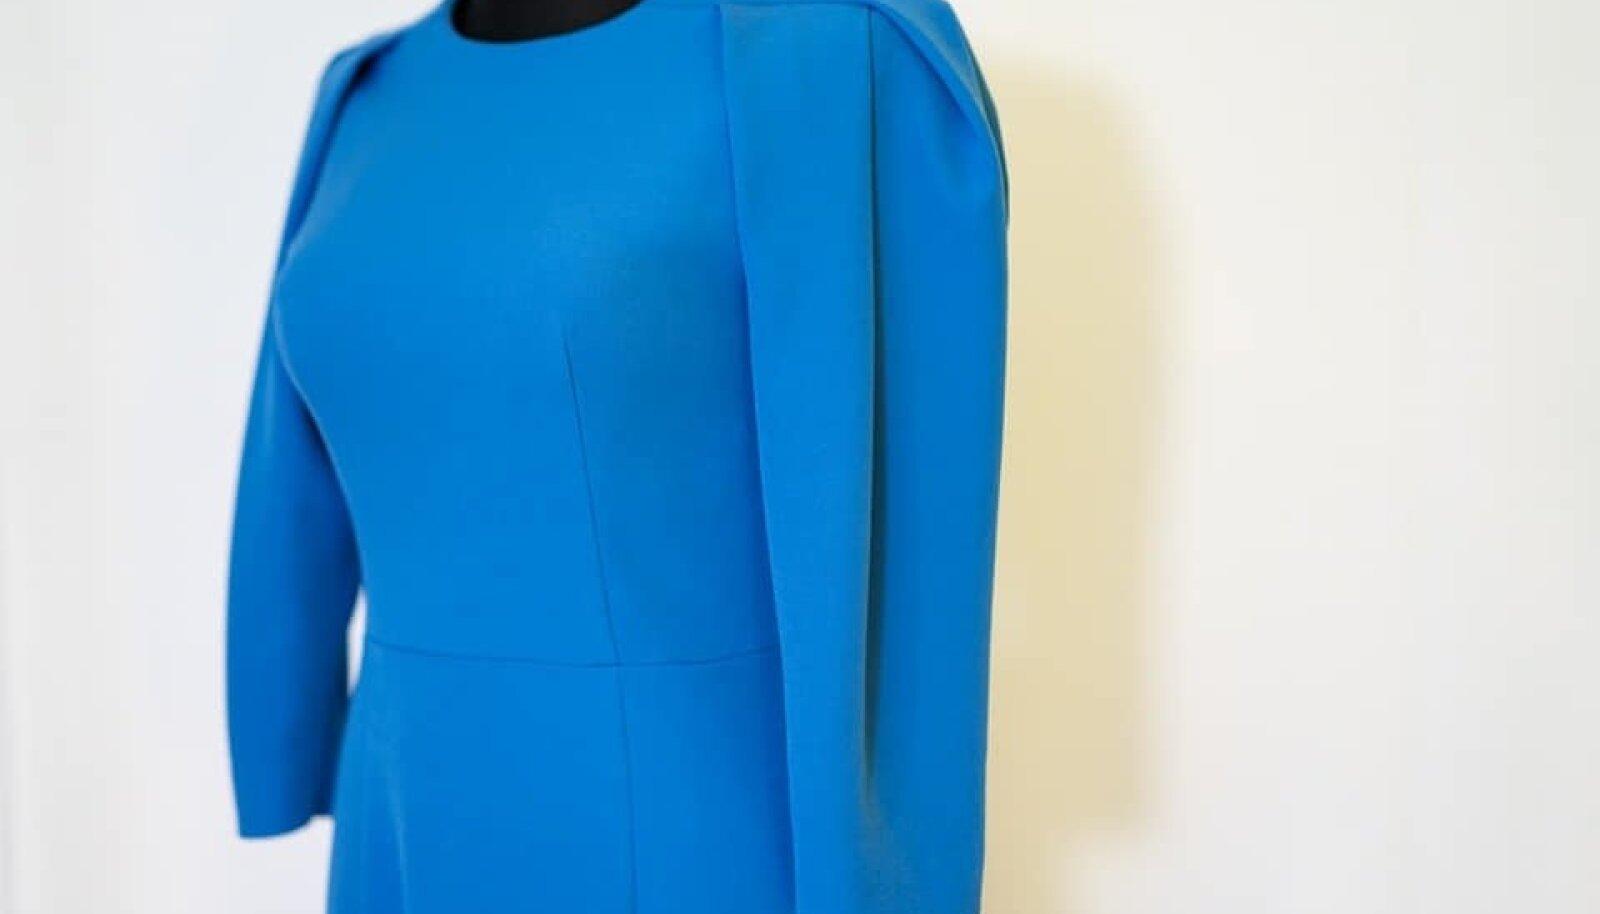 500 Kleiti Kersti Kaljulaid